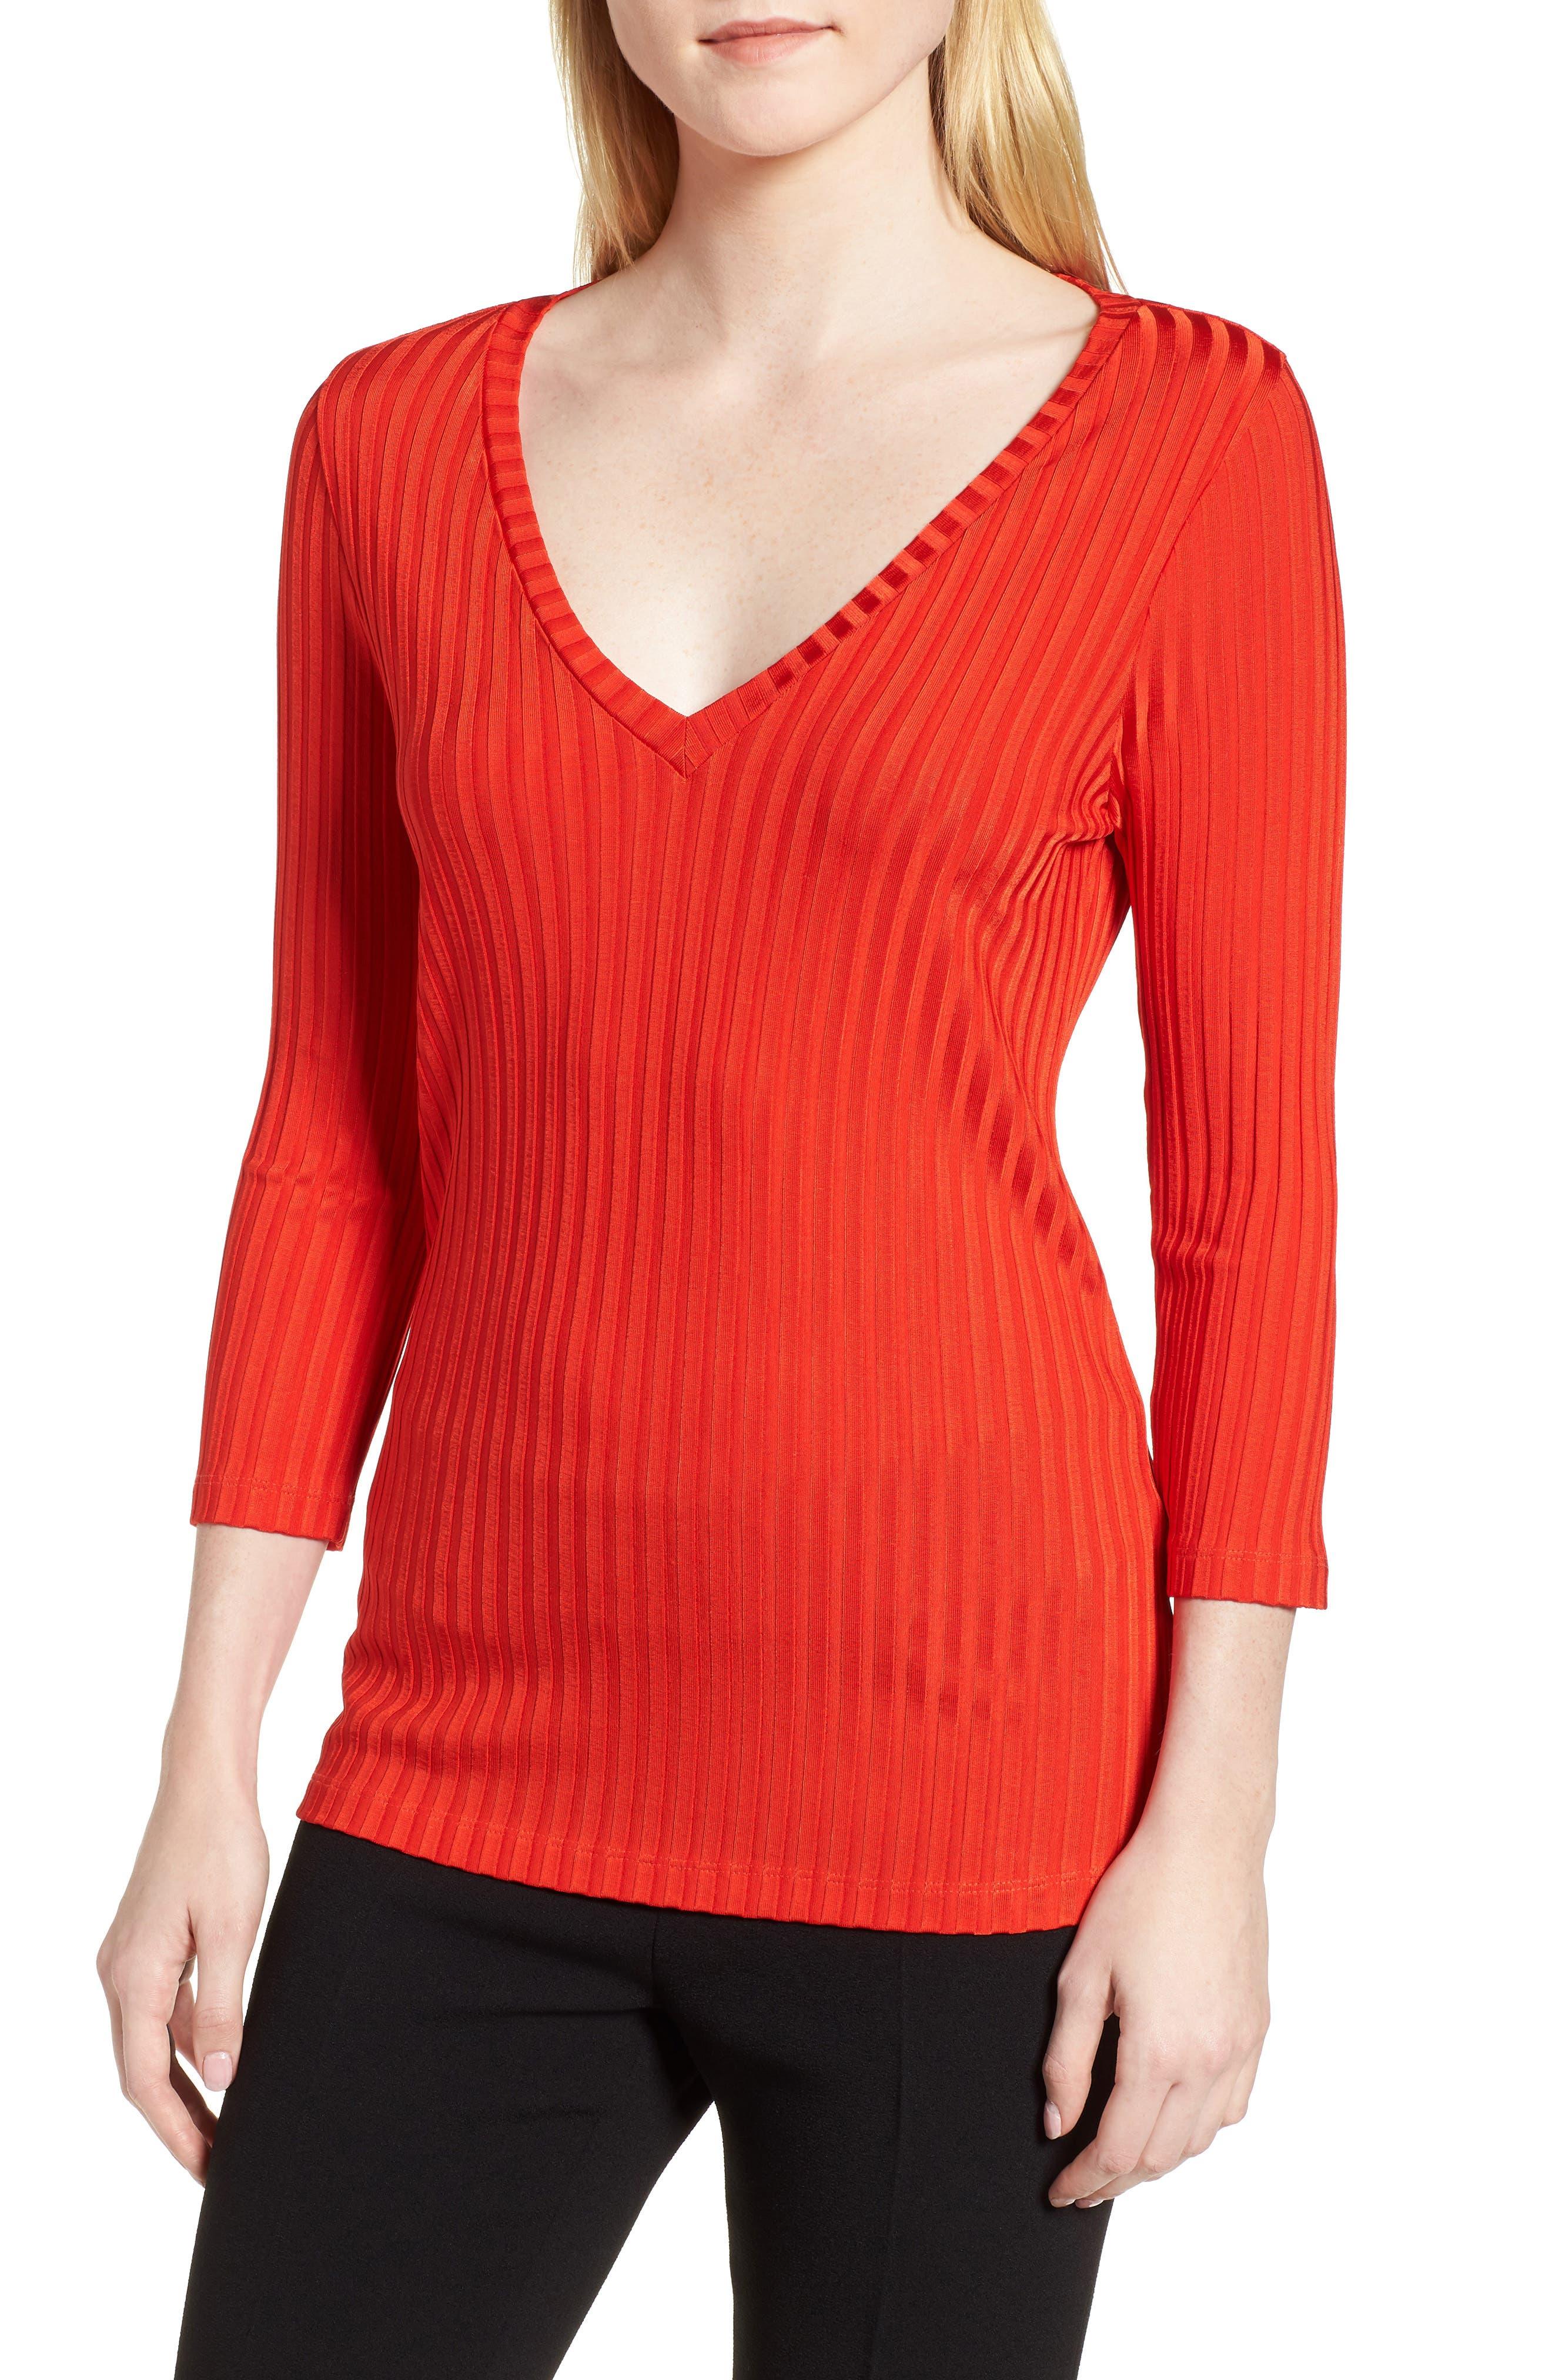 Etrica V-Neck Ribbed Top,                             Main thumbnail 1, color,                             Sunset Orange